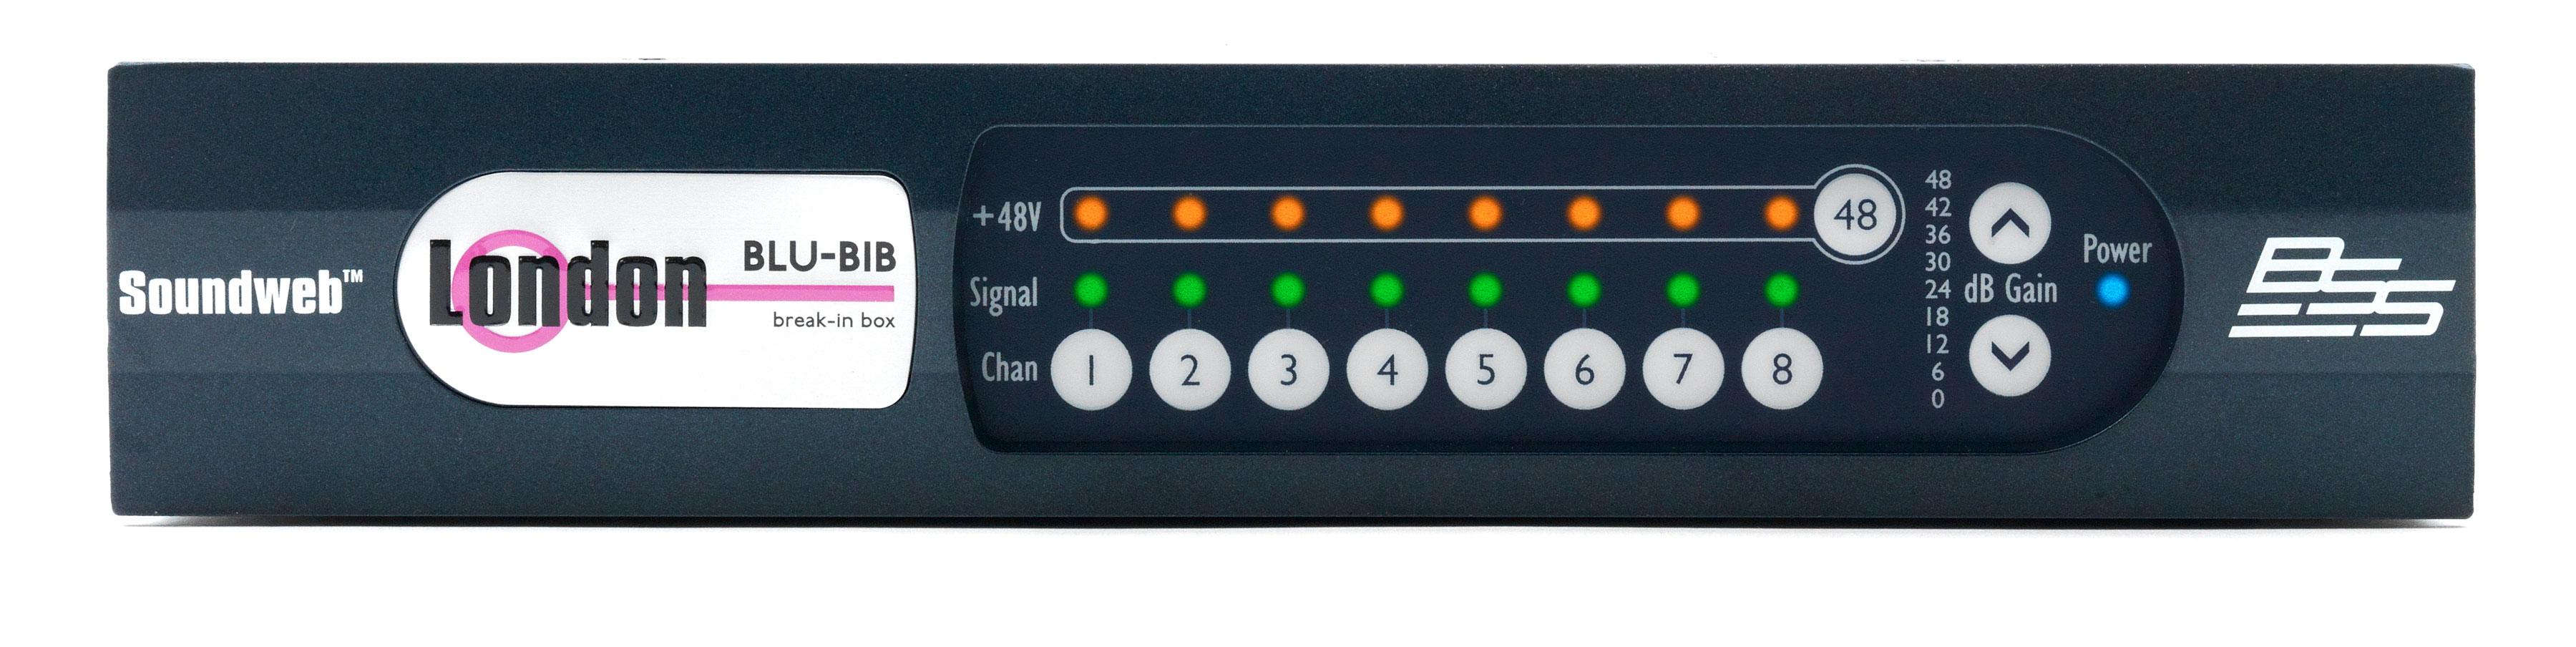 Blu Bib Bss Networked Audio Systems